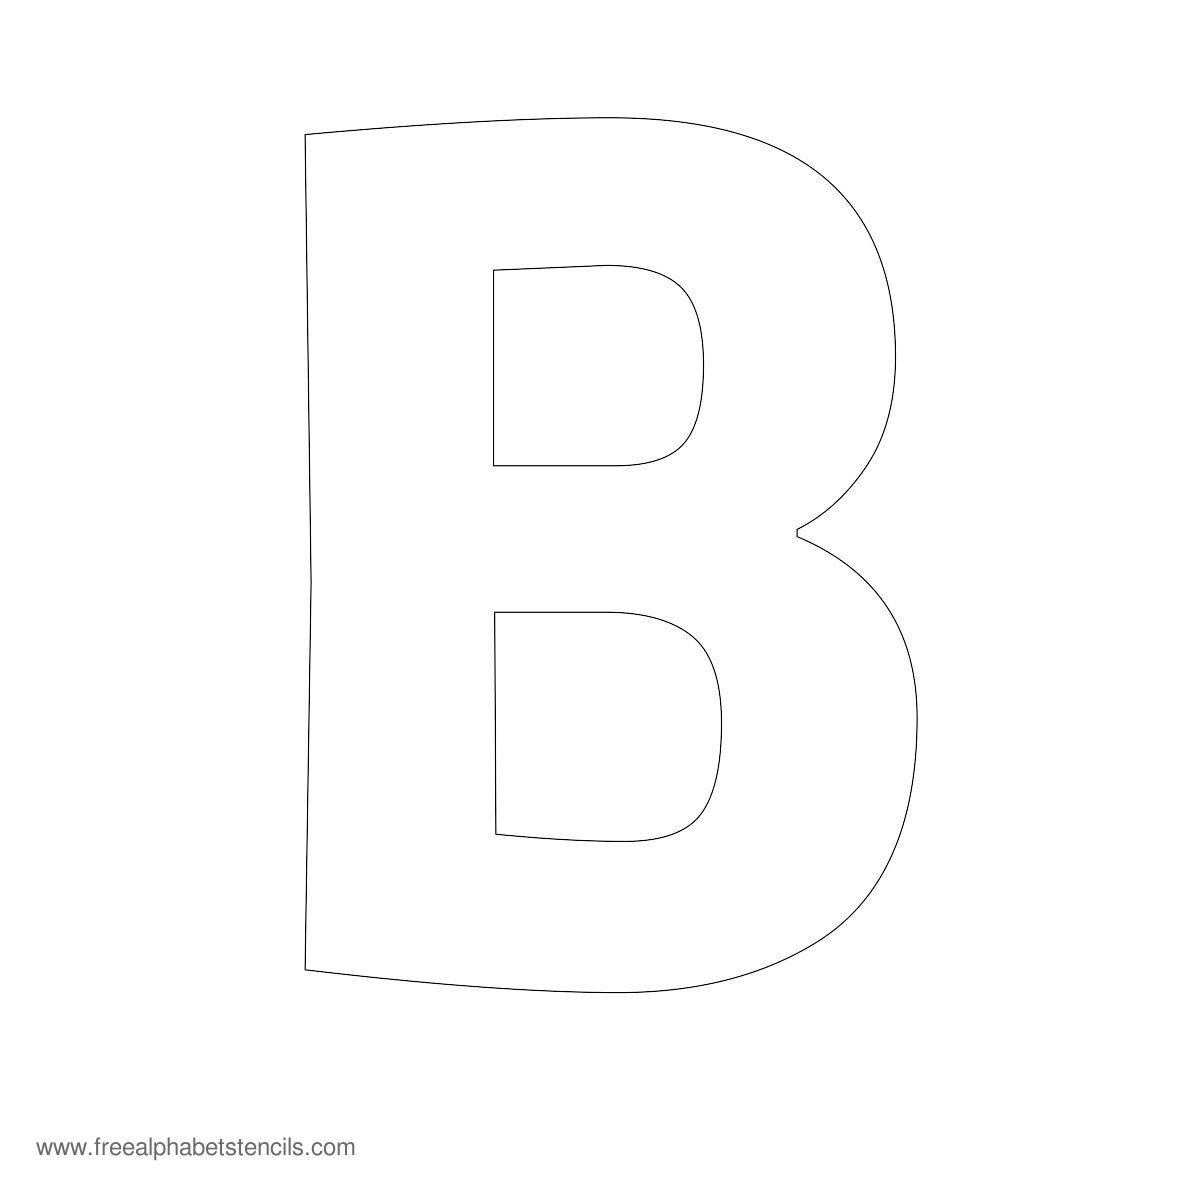 Free Large Printable Letter Stencils